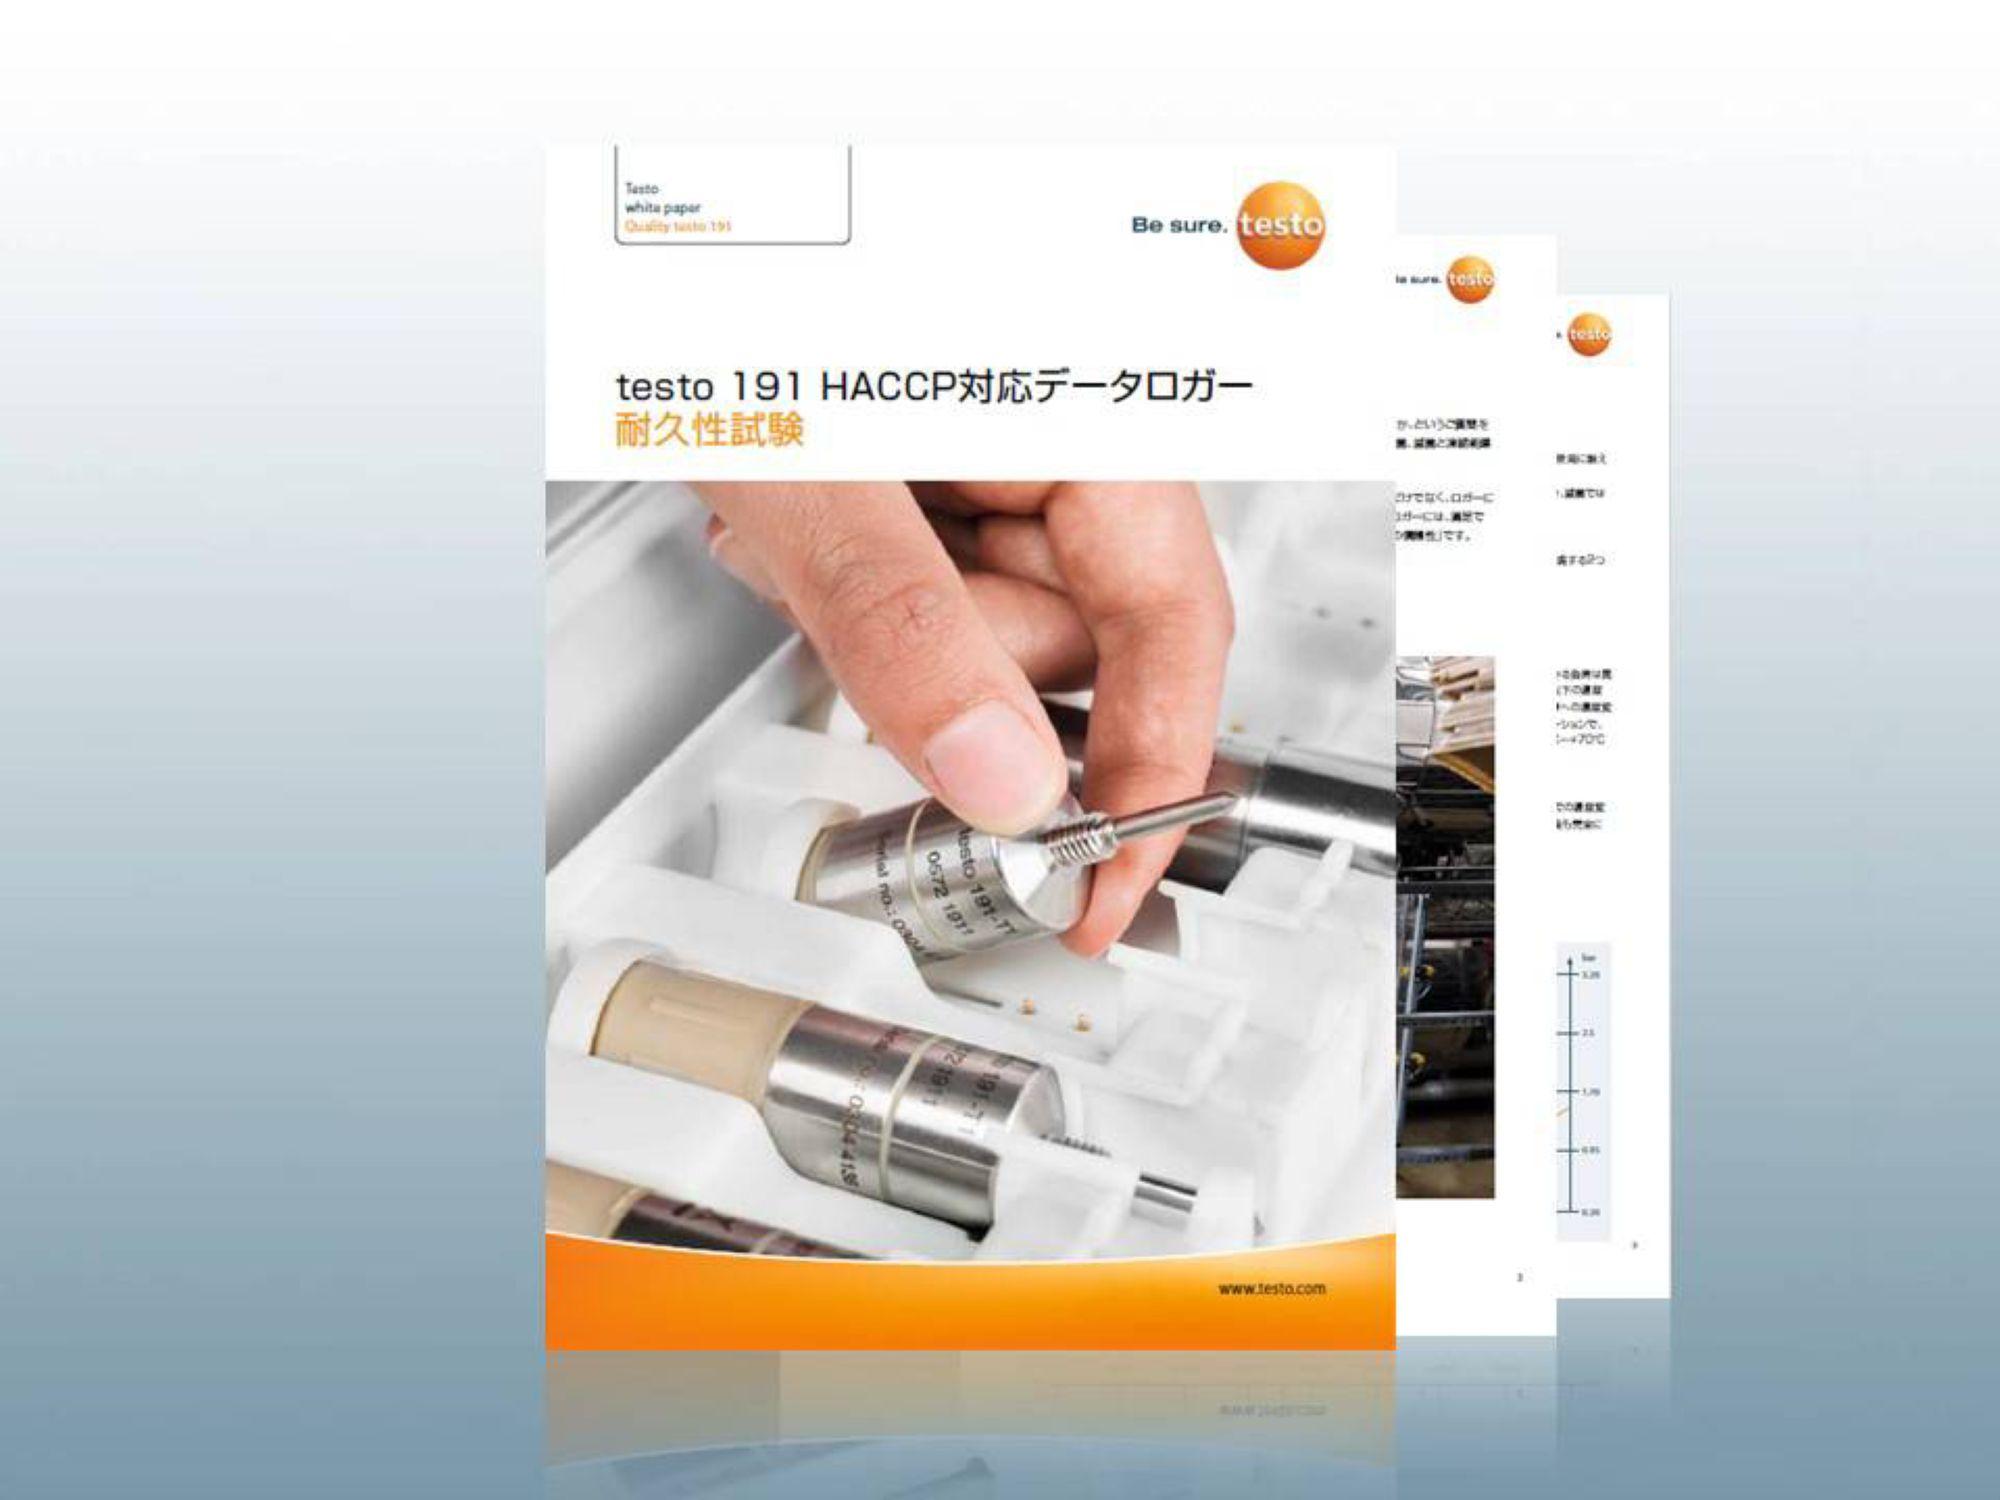 Whitepaper: testo 191 loggers in endurance testing